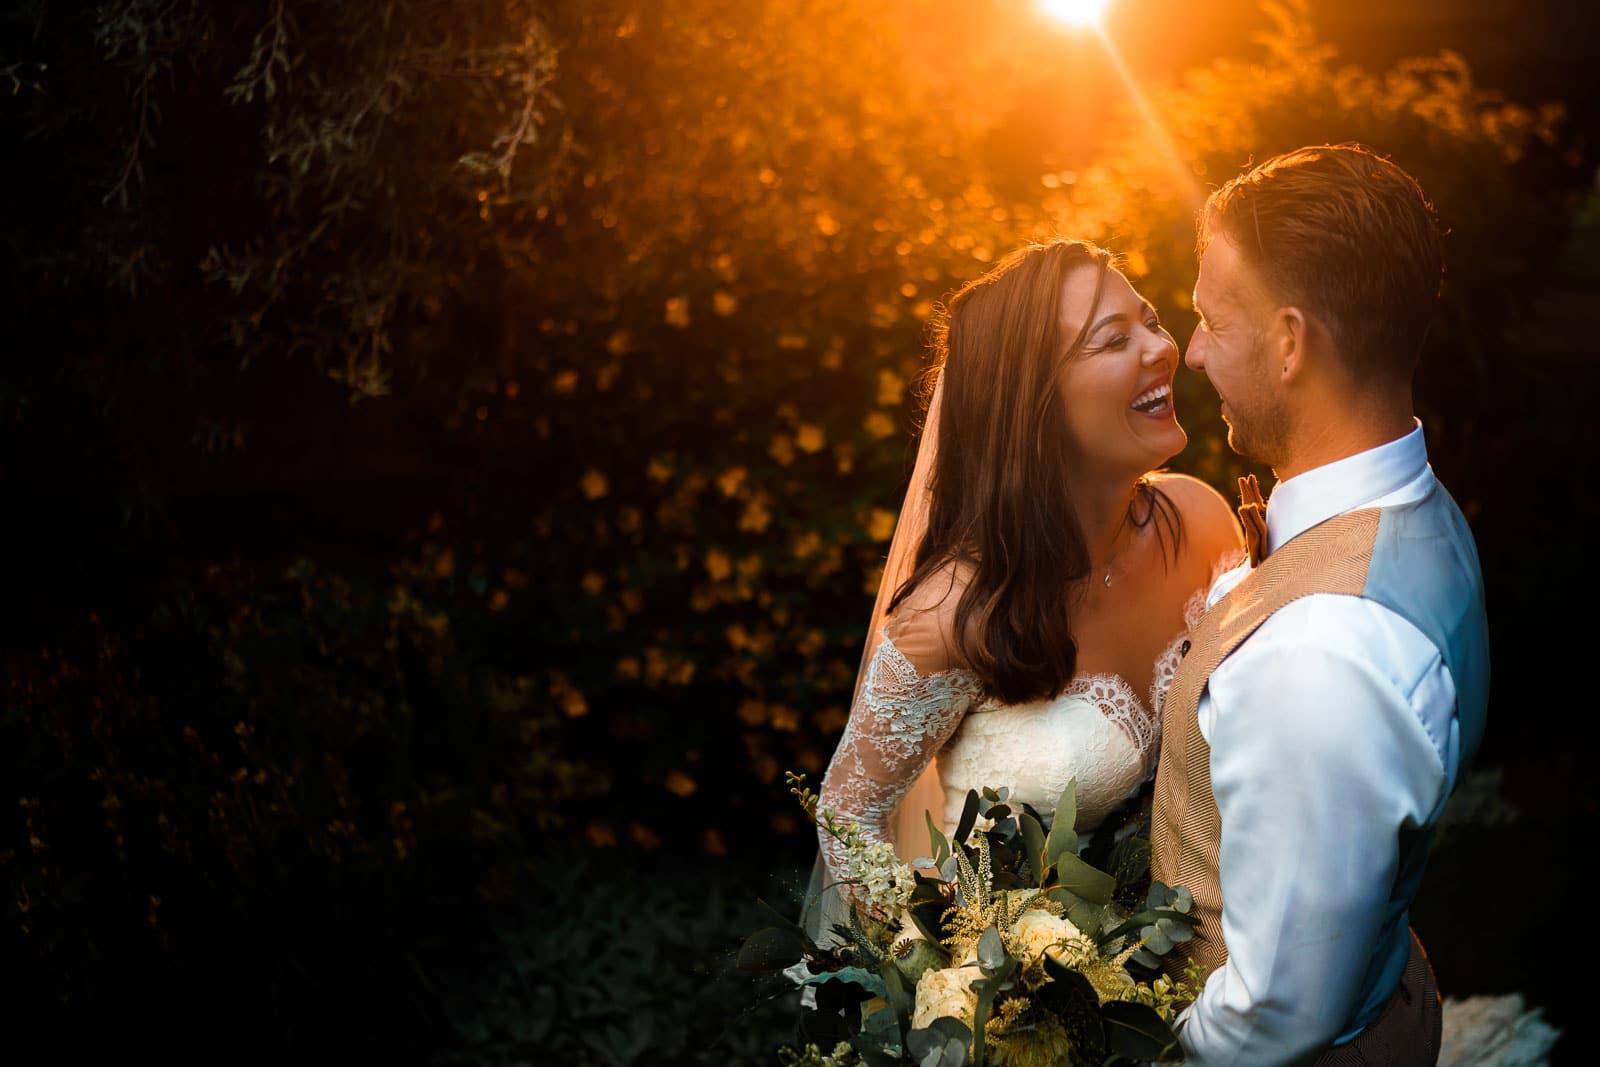 Magmod CTO sunset wedding portrait